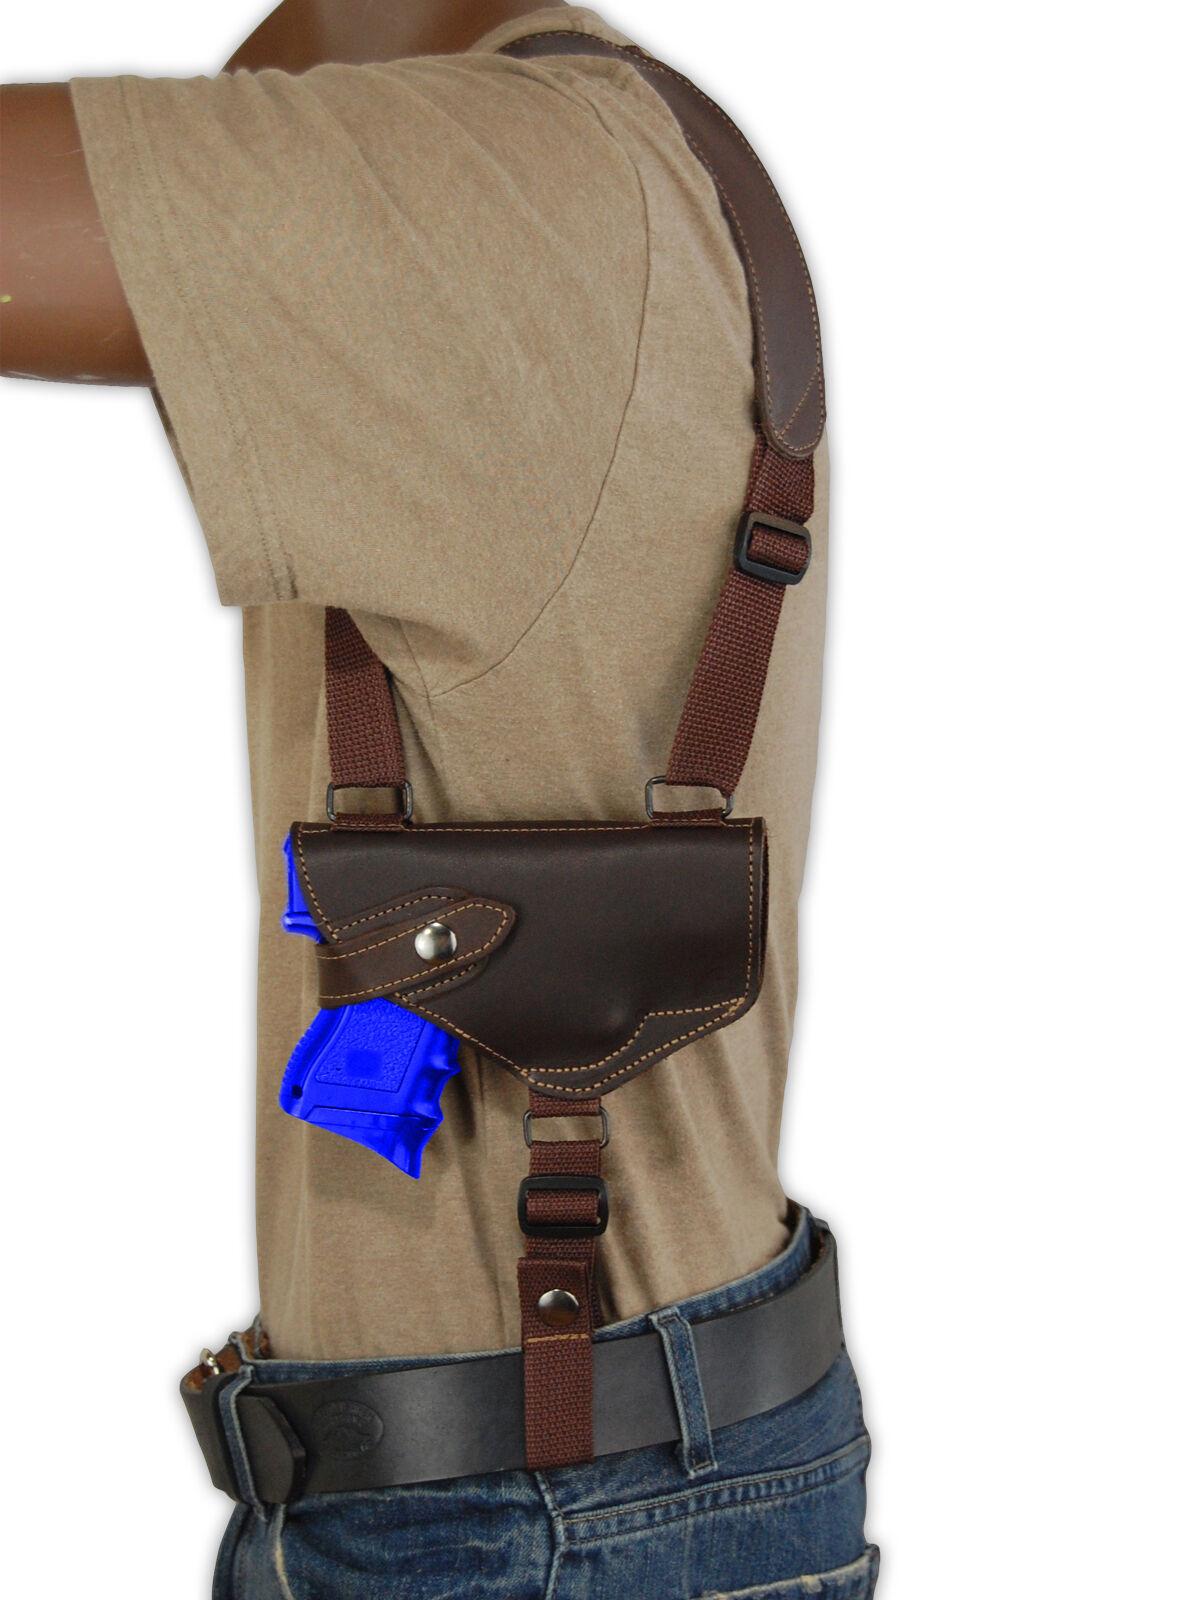 NEW Barsony Braun Leder Horizontal Shoulder Holster Springfield XD-S w/ LASER